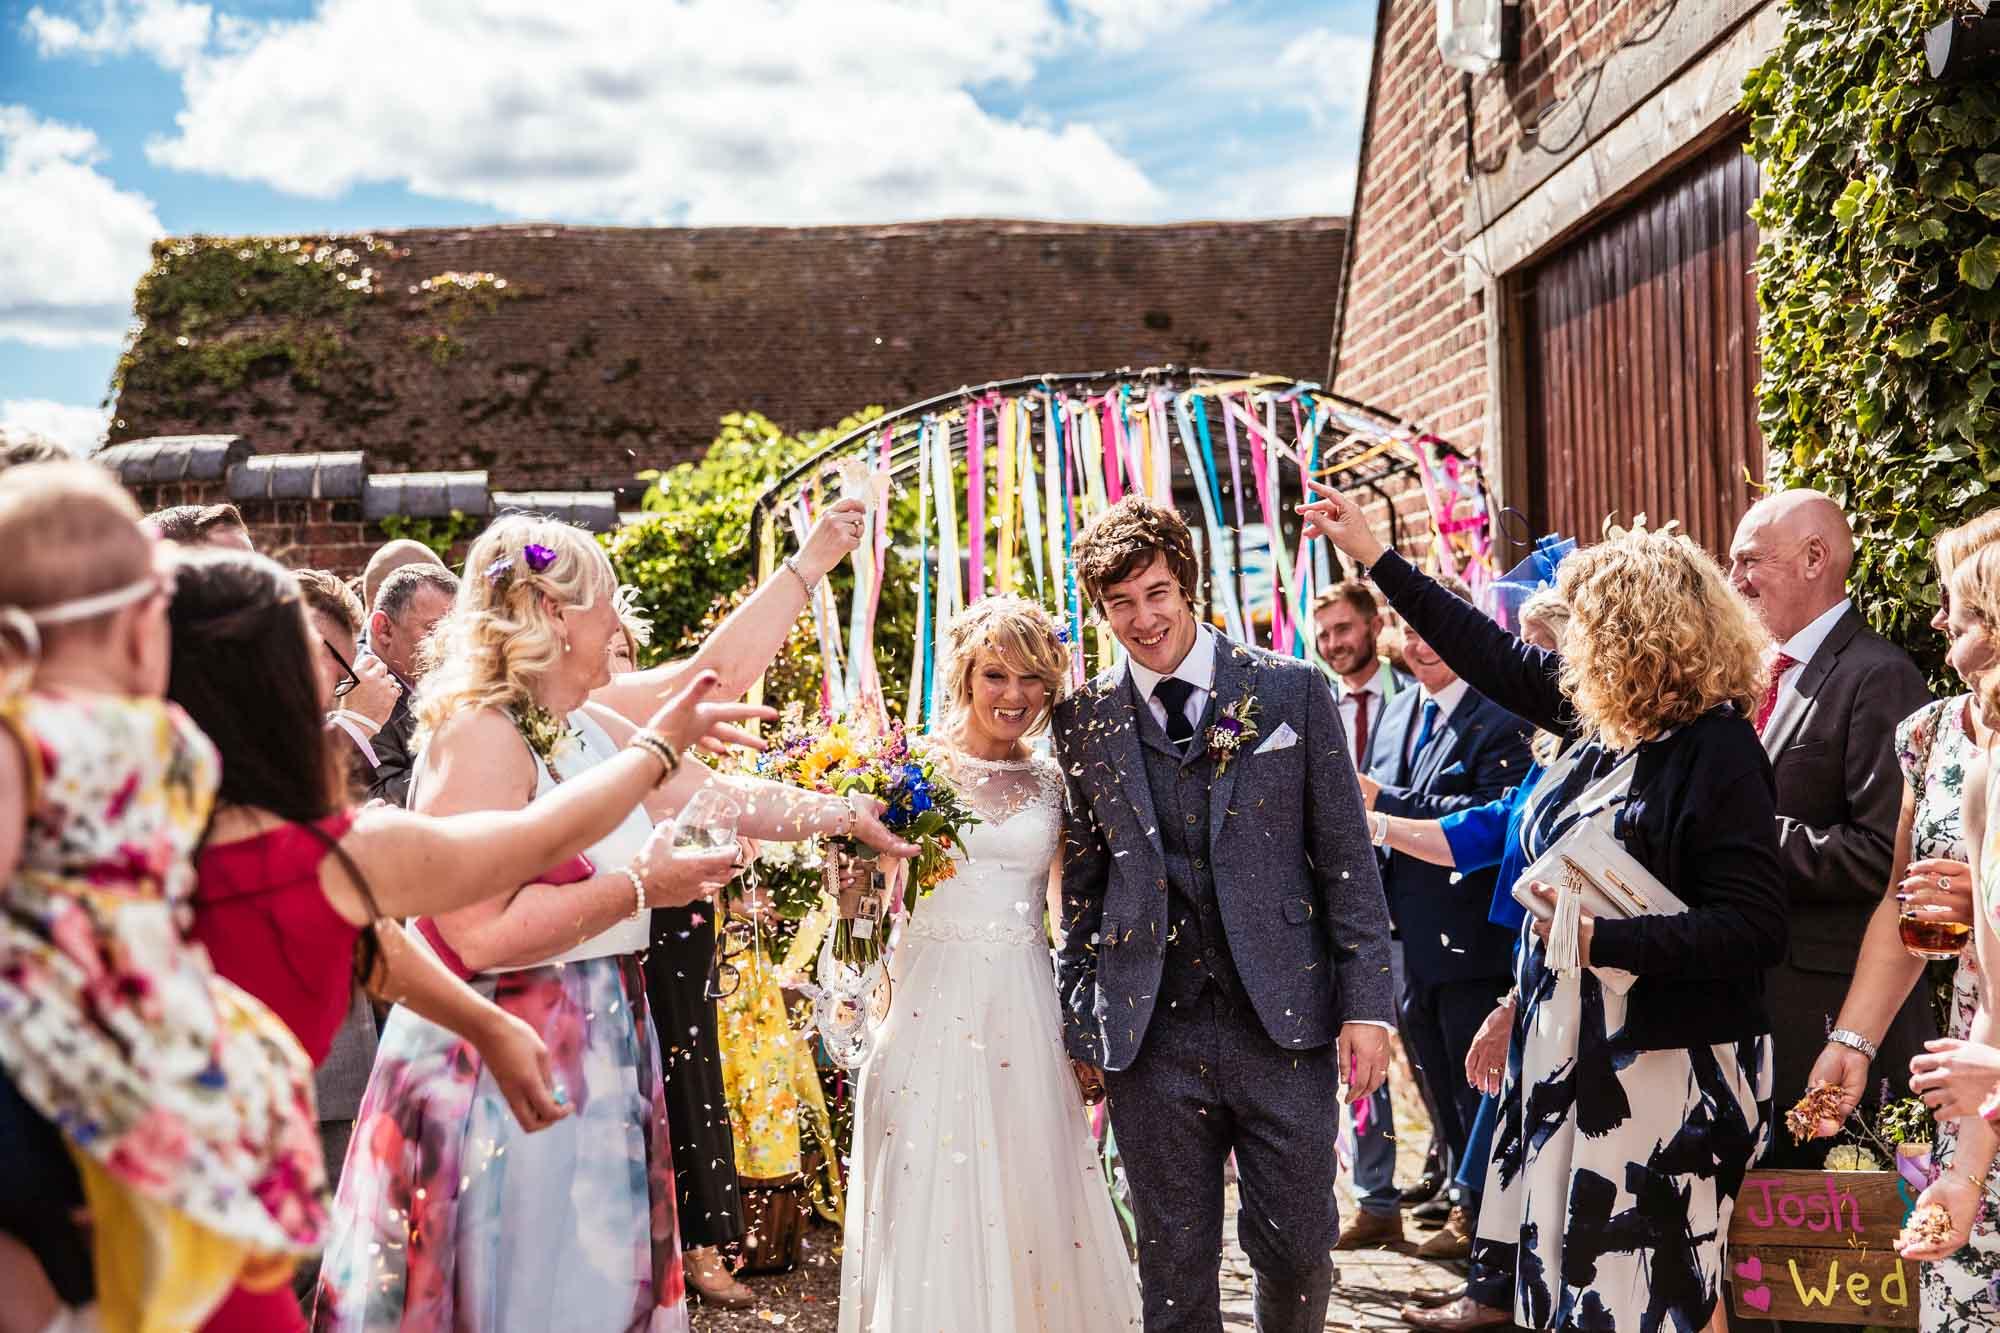 Colourful Vintage Barn Weddings